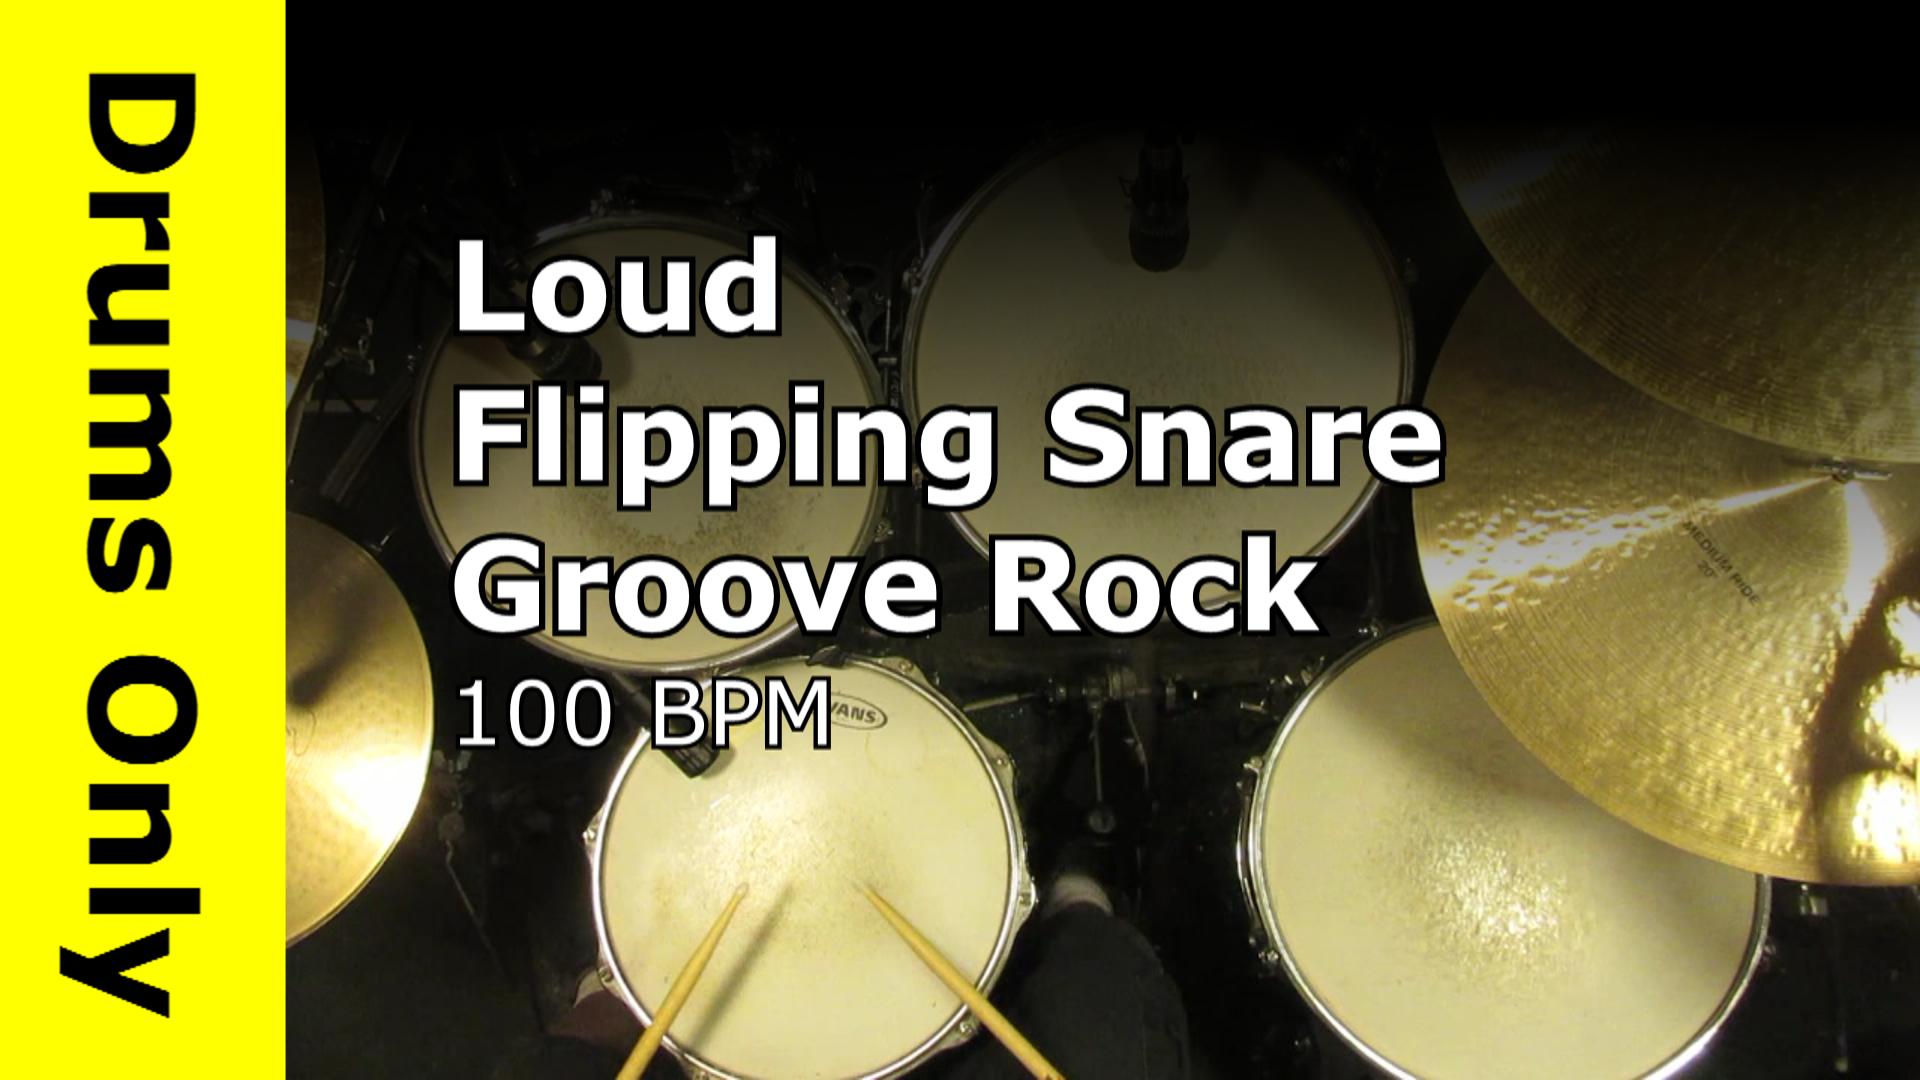 Drum Loops & Full Length Beats